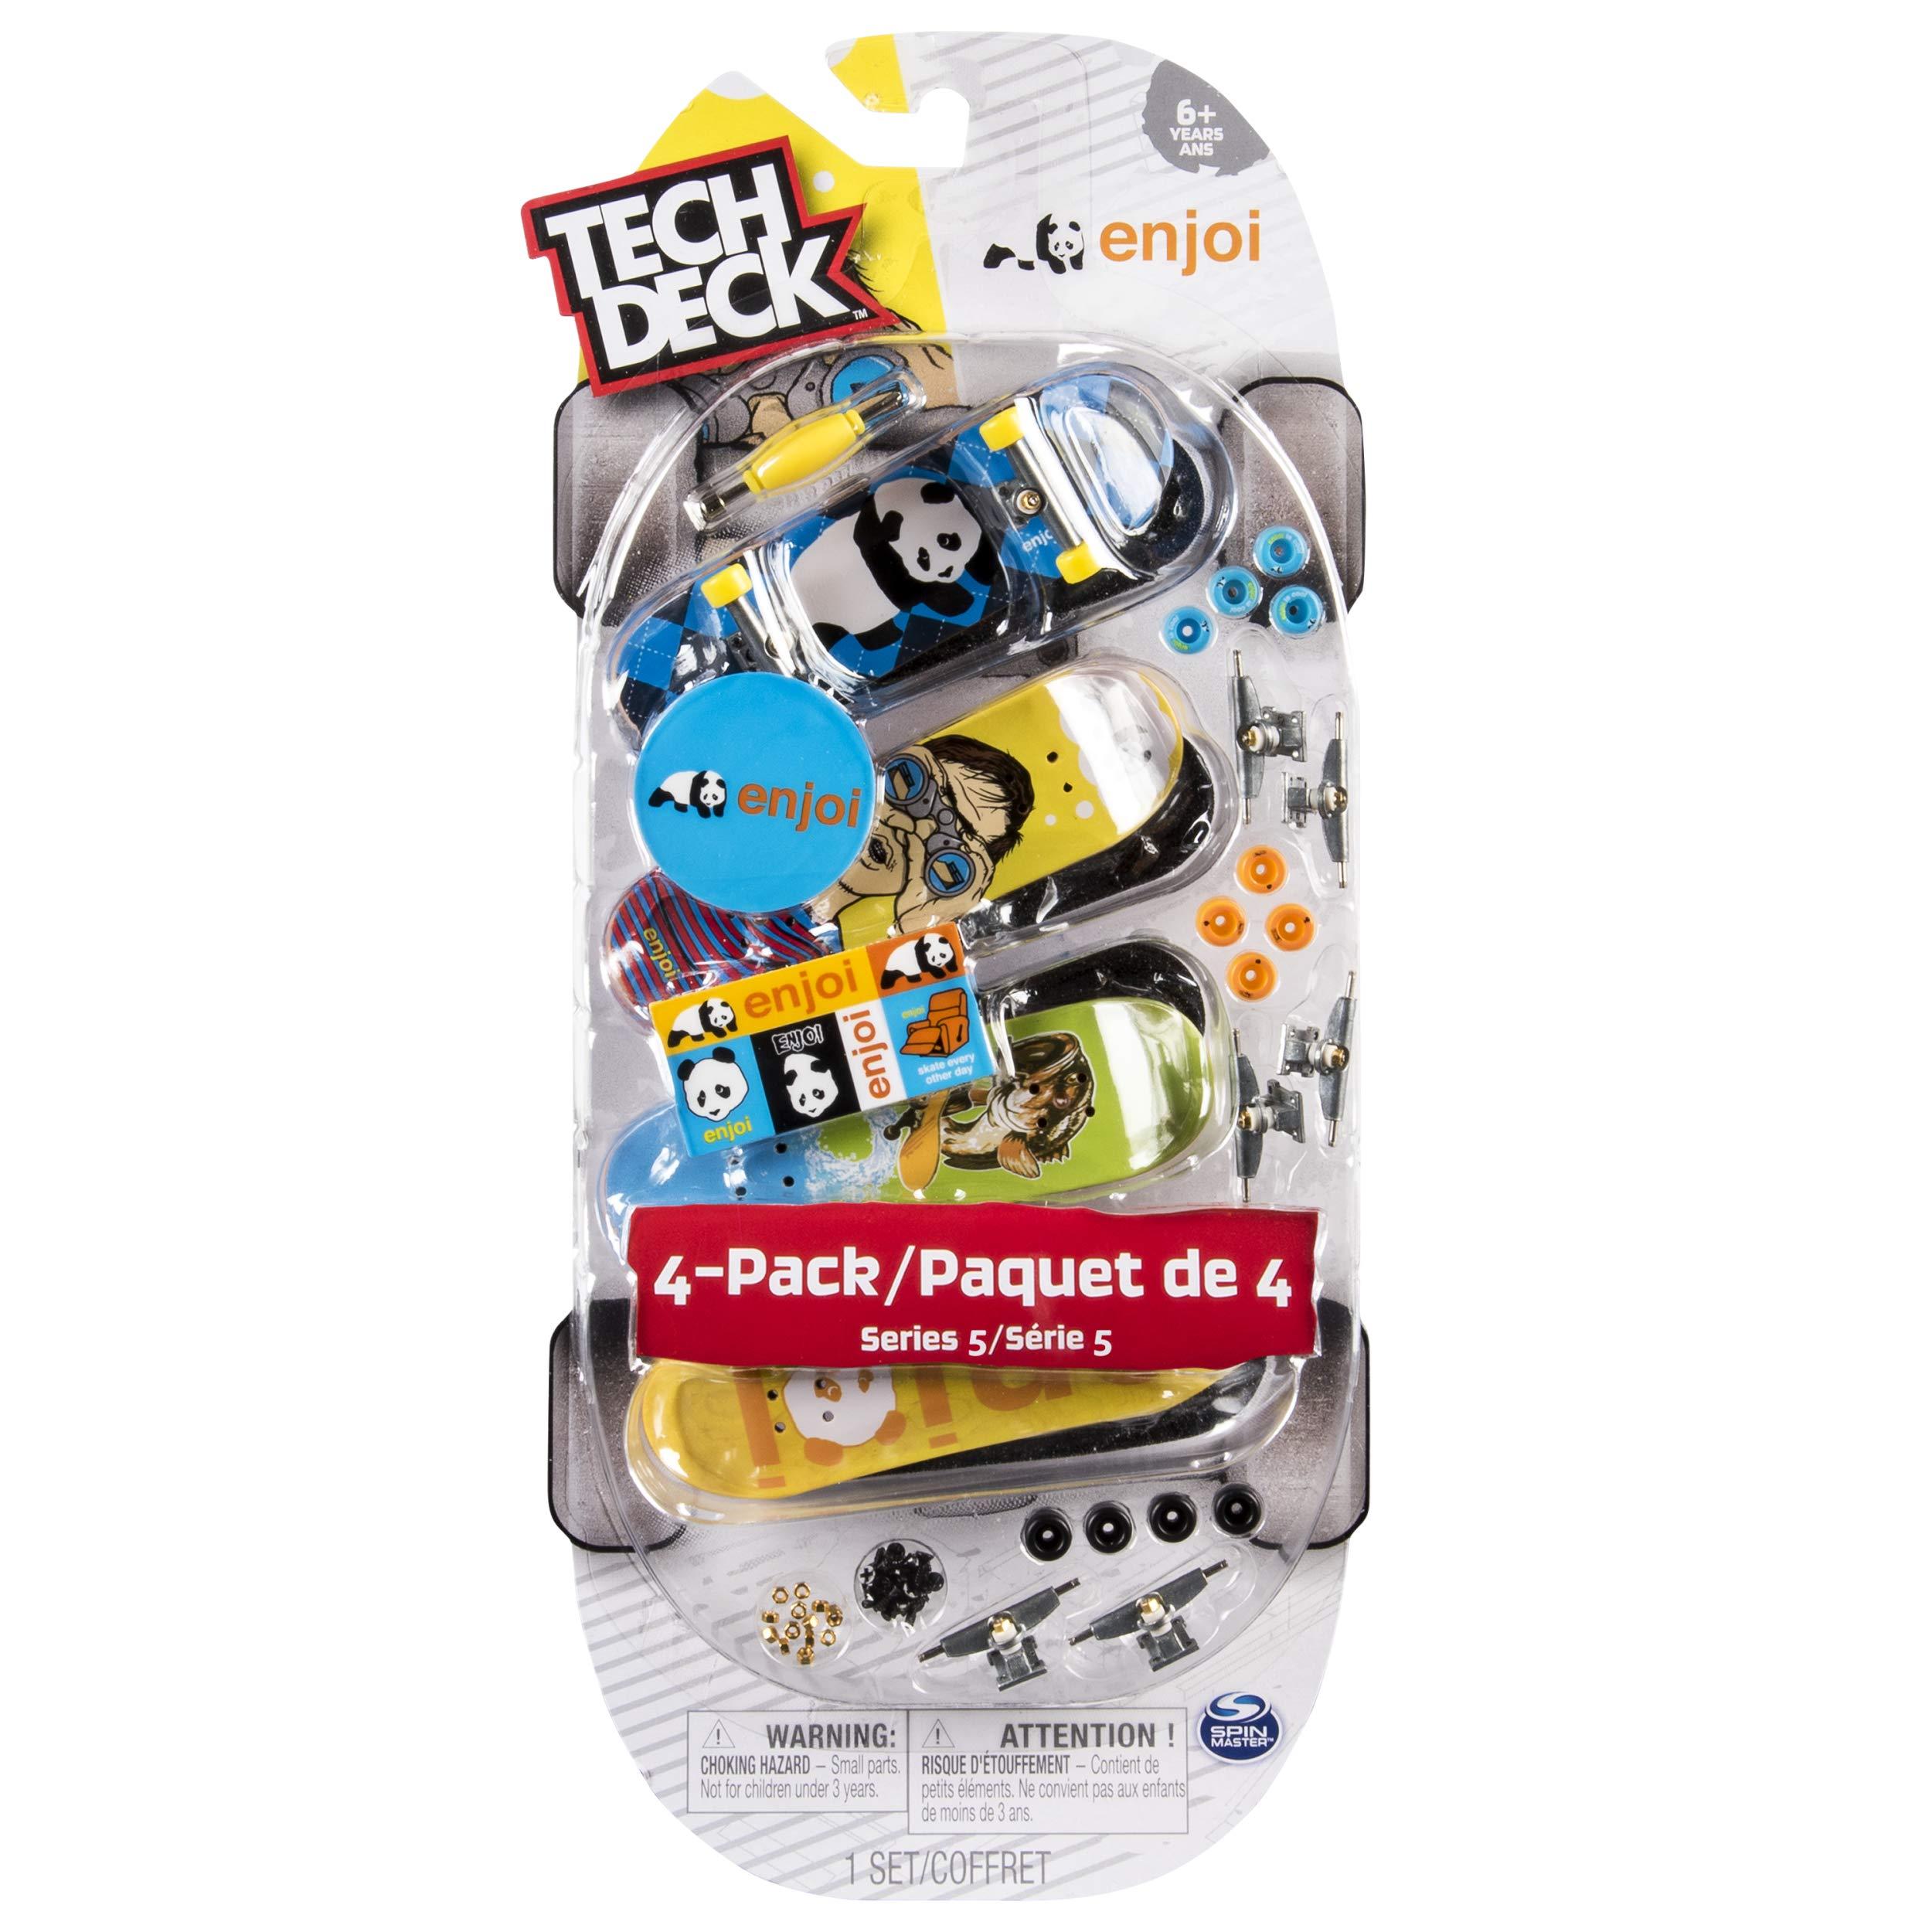 TECH DECK - 96mm Fingerboards - 4-Pack - Enjoi